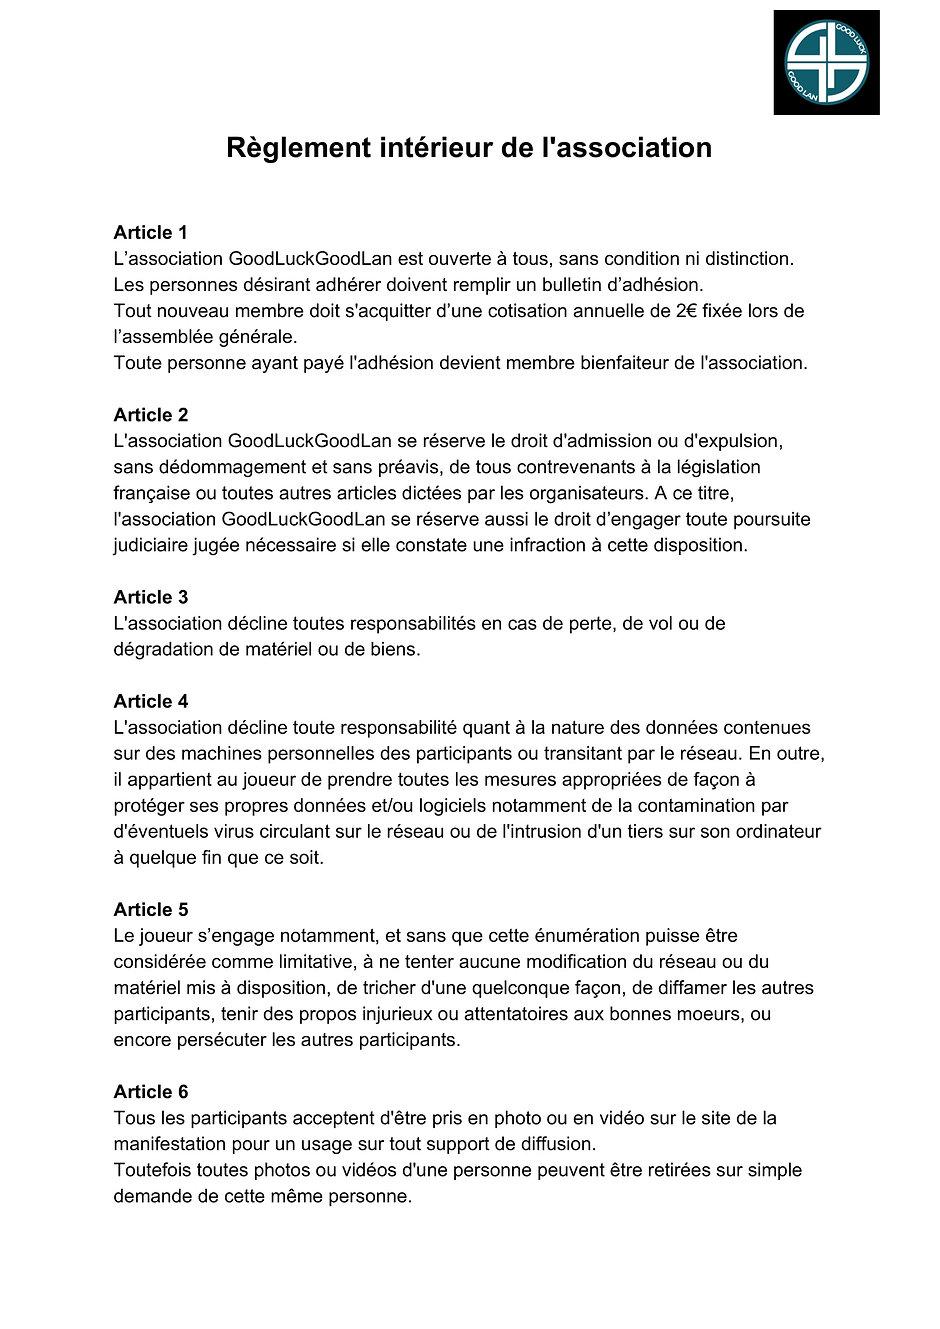 Règlement_de_l'association-1.jpg